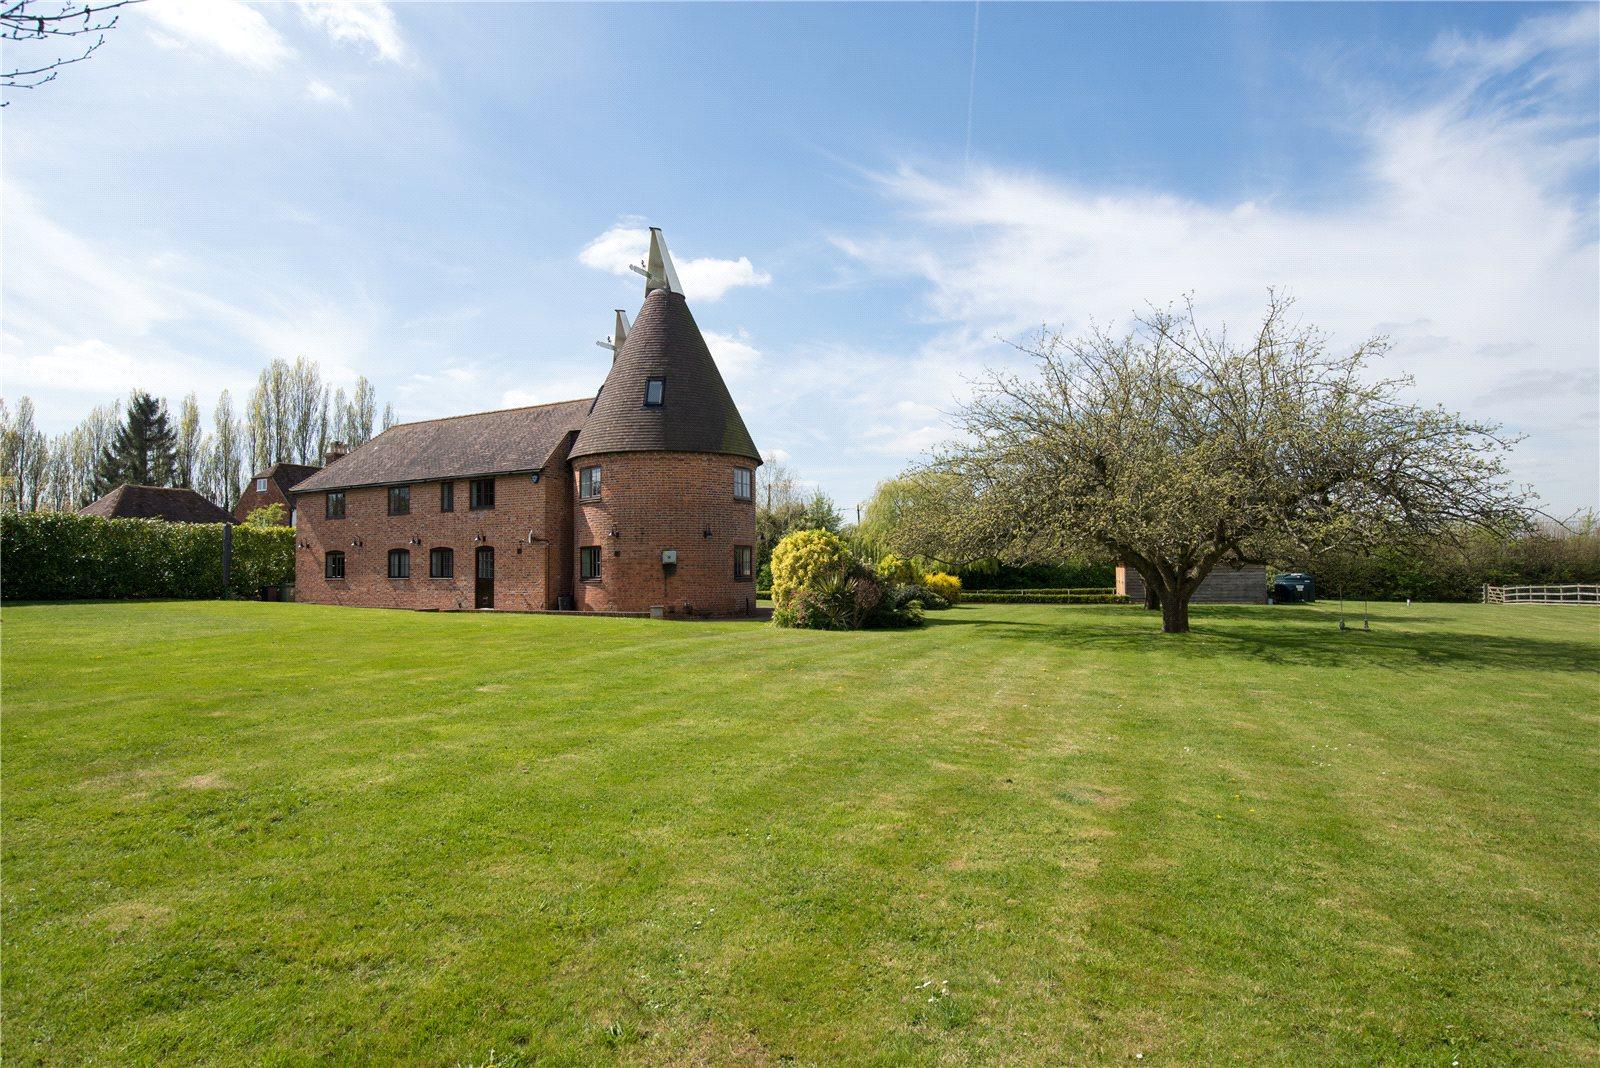 Single Family Home for Sale at Back Street, Leeds, Maidstone, Kent, ME17 Maidstone, England